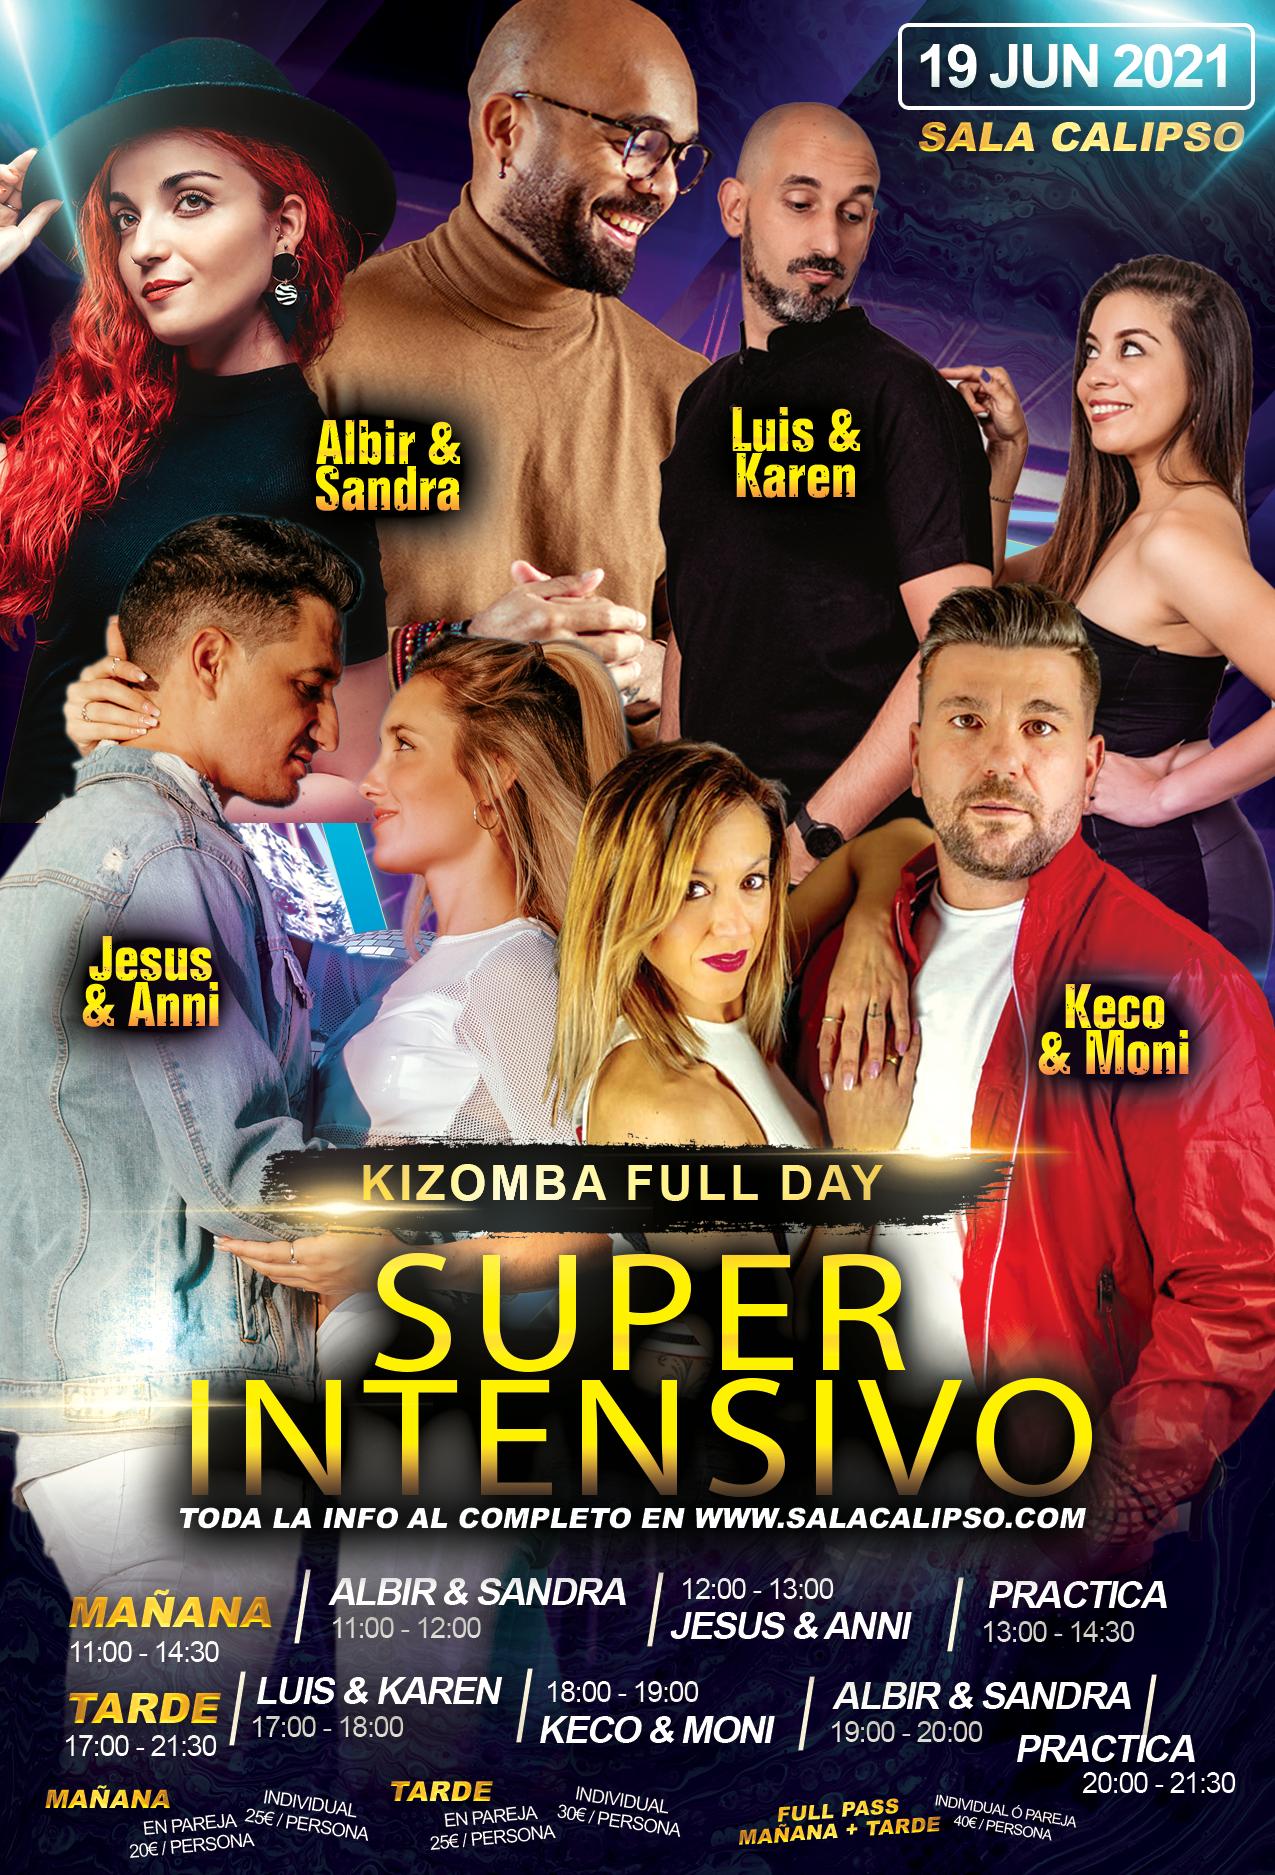 Super Intensivo Kizomba - Sabado 19 Junio 2021 - Sala Calipso